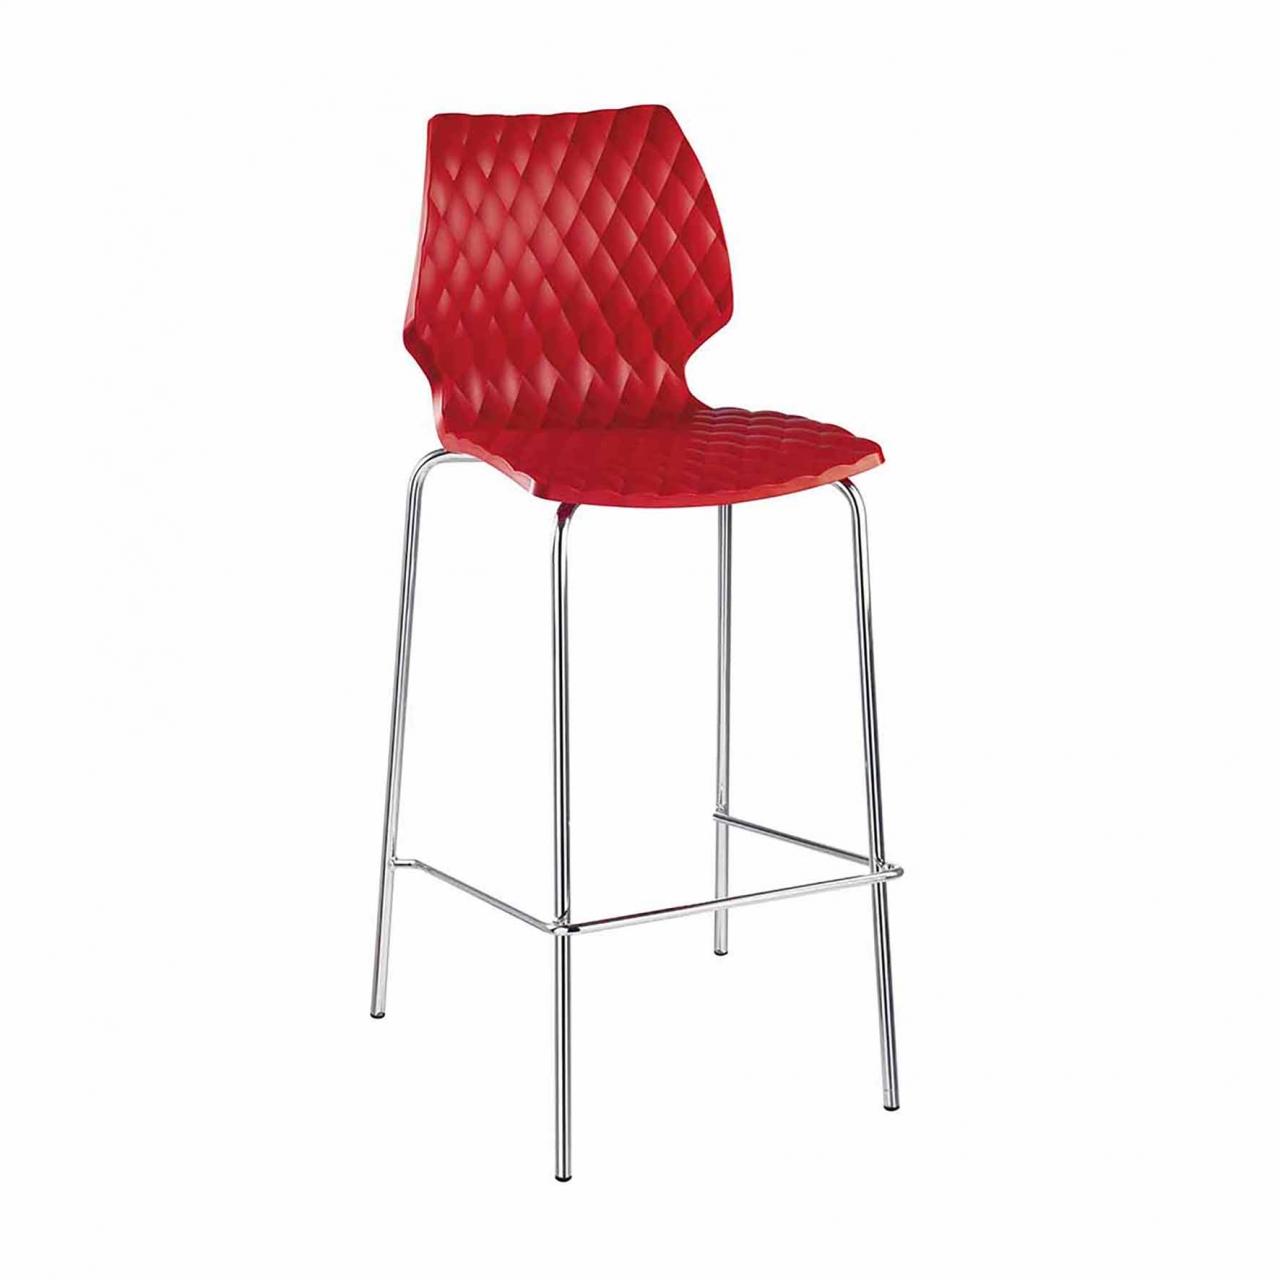 mobilier coulomb tabrouret uni 378 mobilier terrasse de bar restaurant chr tabouret de. Black Bedroom Furniture Sets. Home Design Ideas